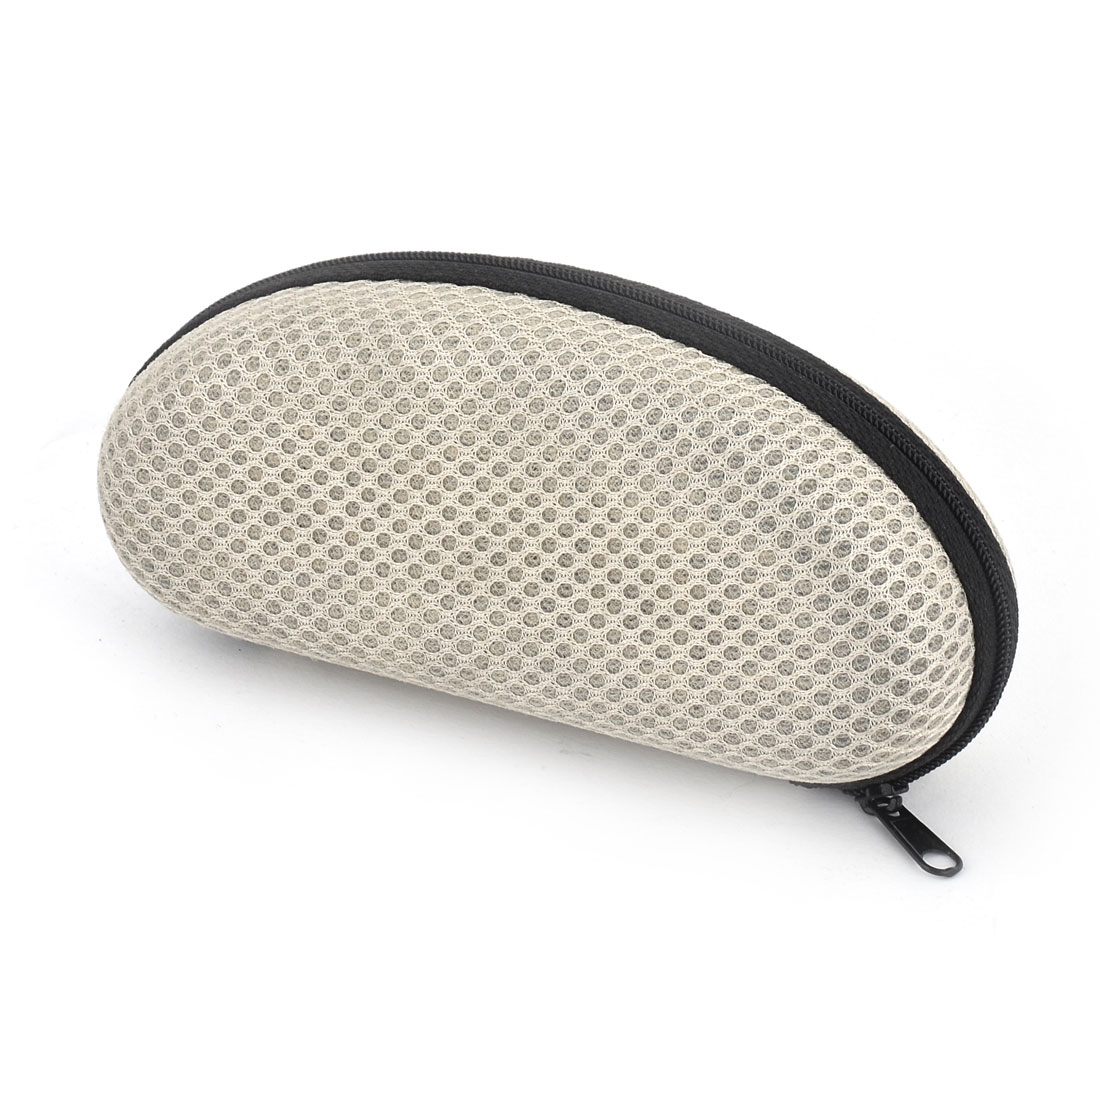 Nylon Lining Oval Shaped Zipper Closure Glasses Box Case Beige Black